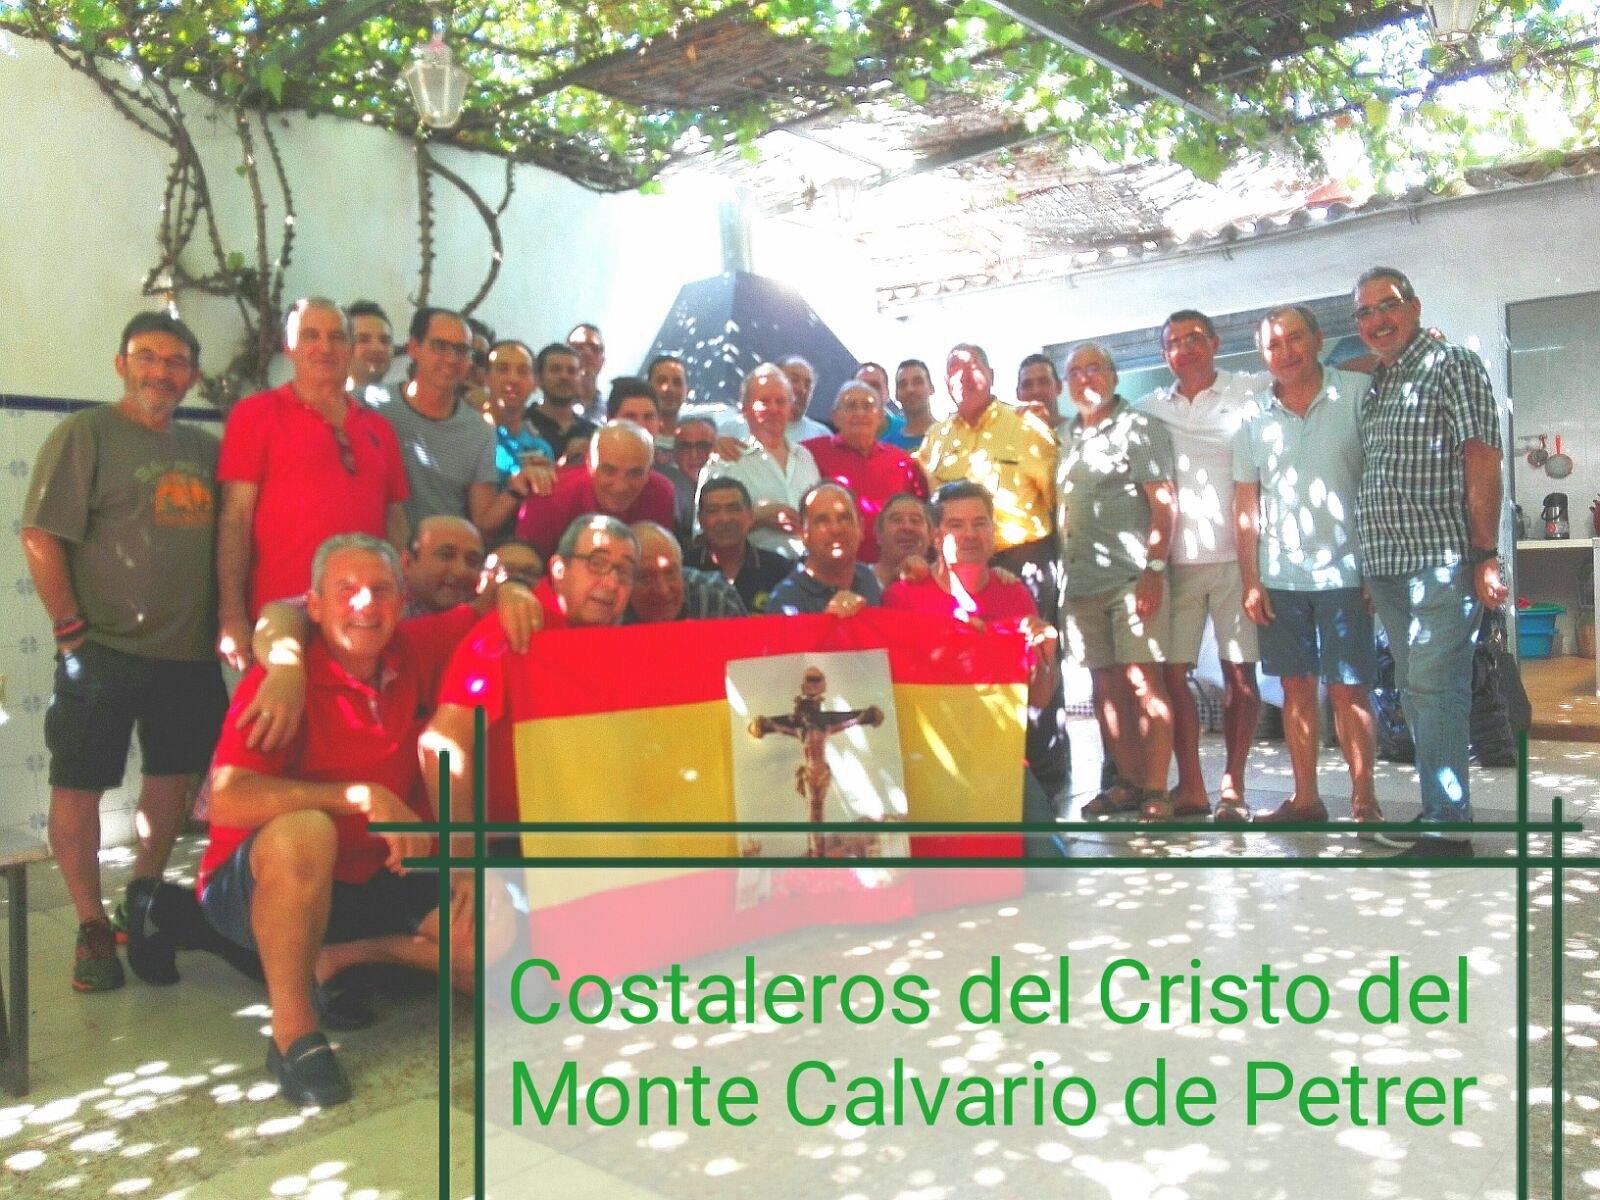 (2017-06-14) - Almuerzo del Costalero - Javier  Romero Ripoll  (01).jpg